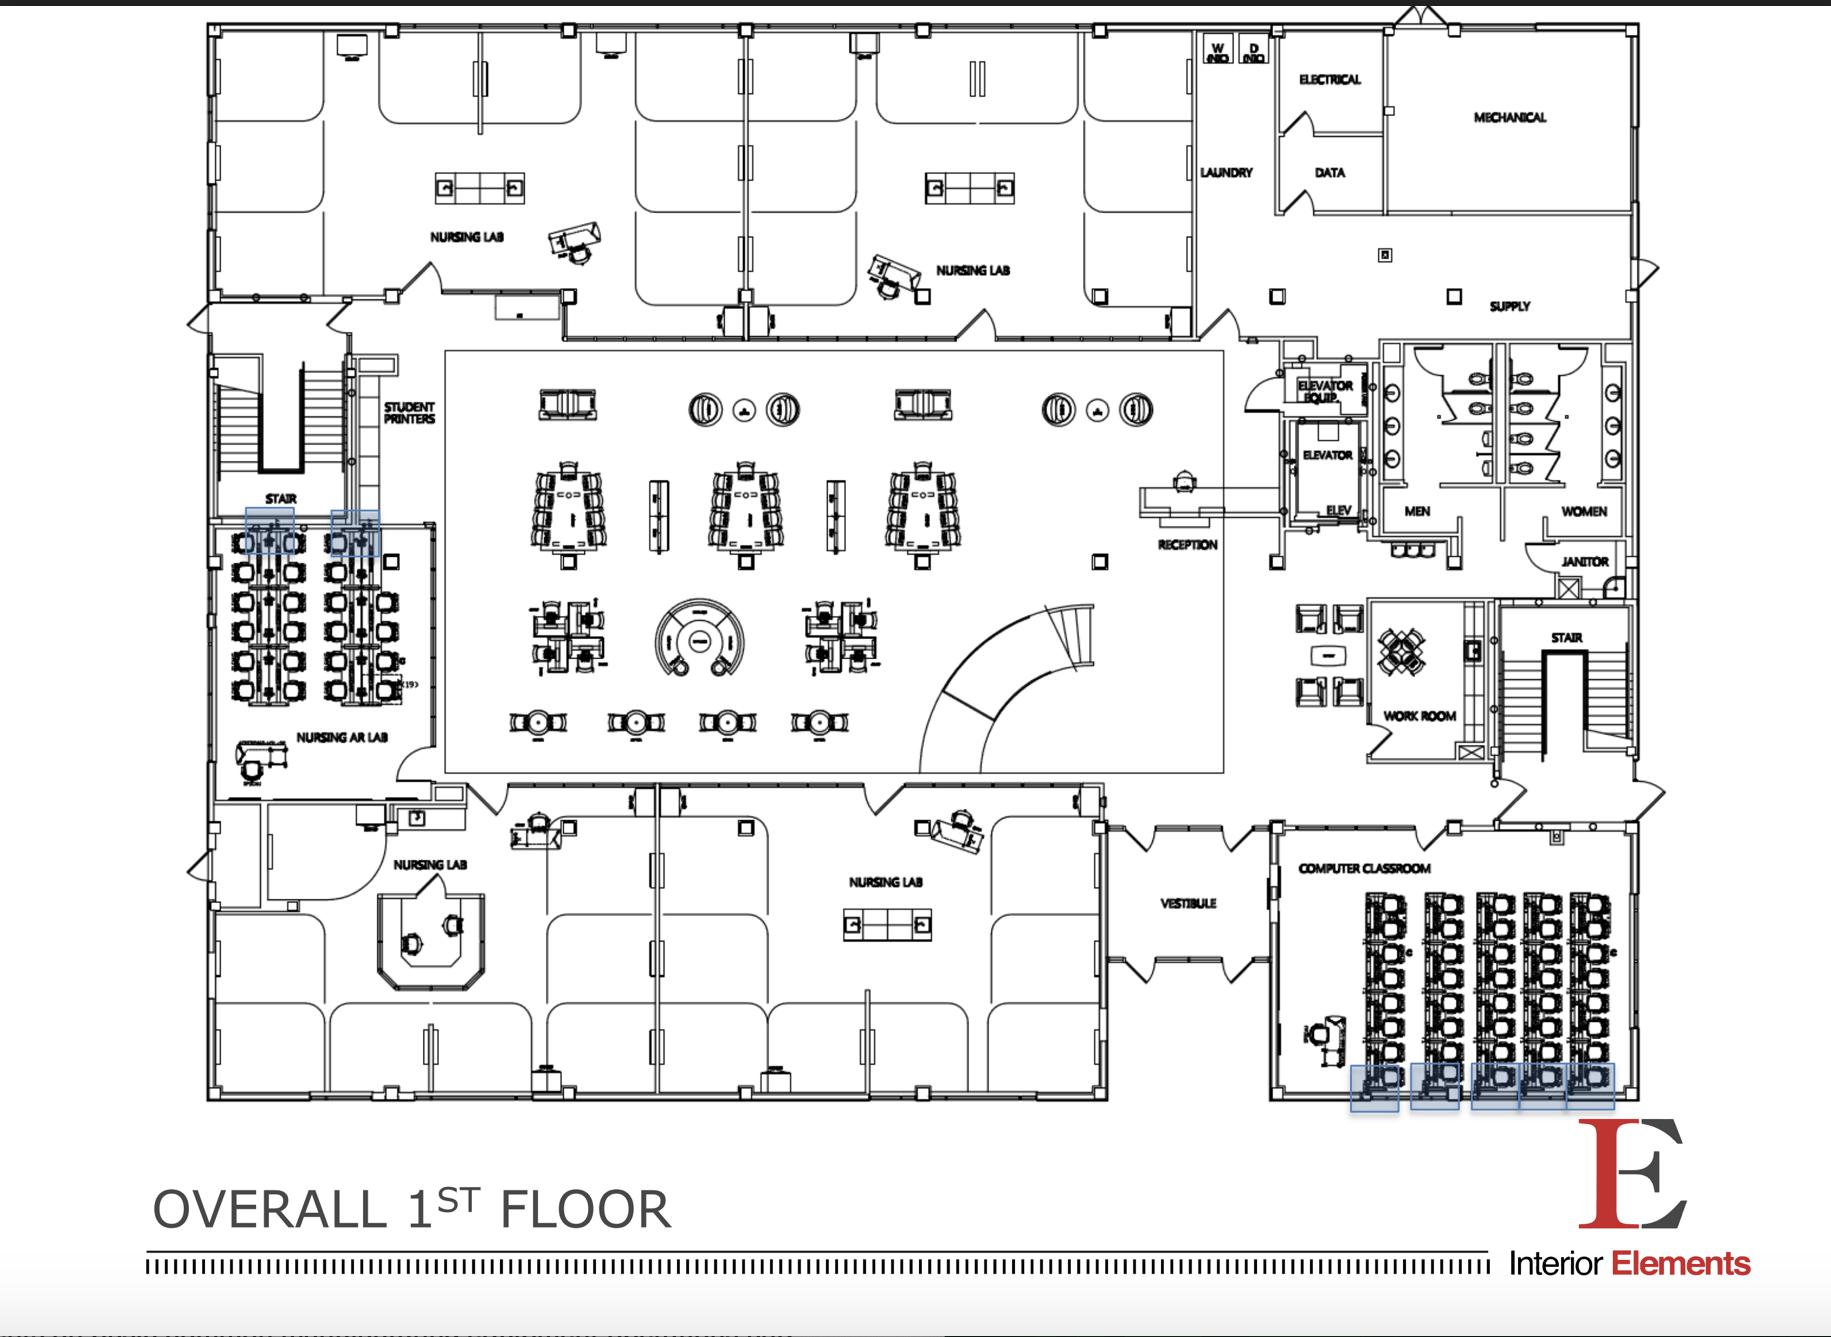 Health Sciences Building 1st Floor - Bishop State Community College - Bishop State Foundation - Mobile AL